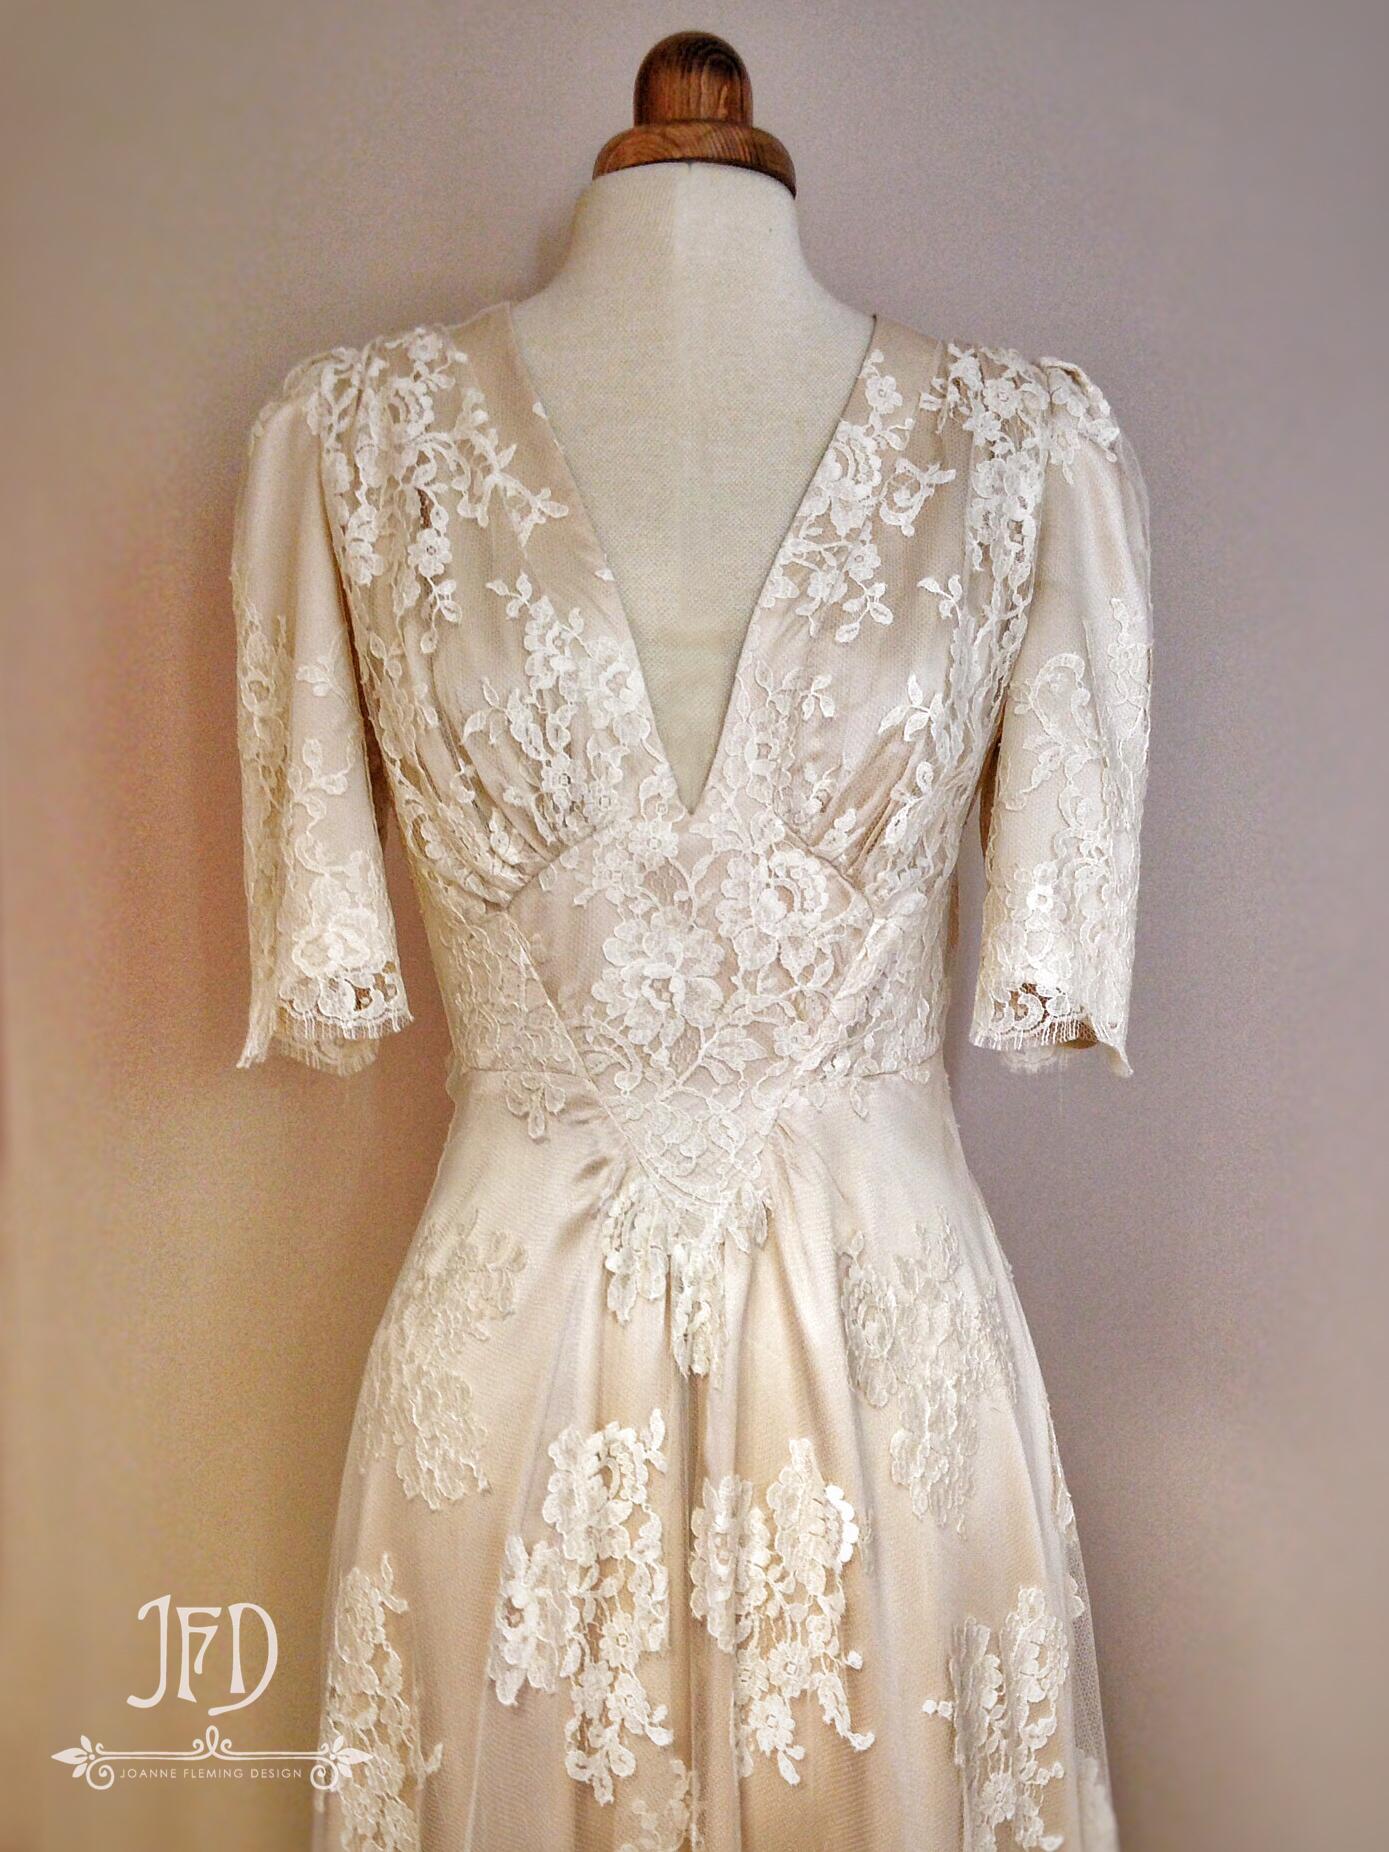 1940s inspired wedding dresses photo - 1